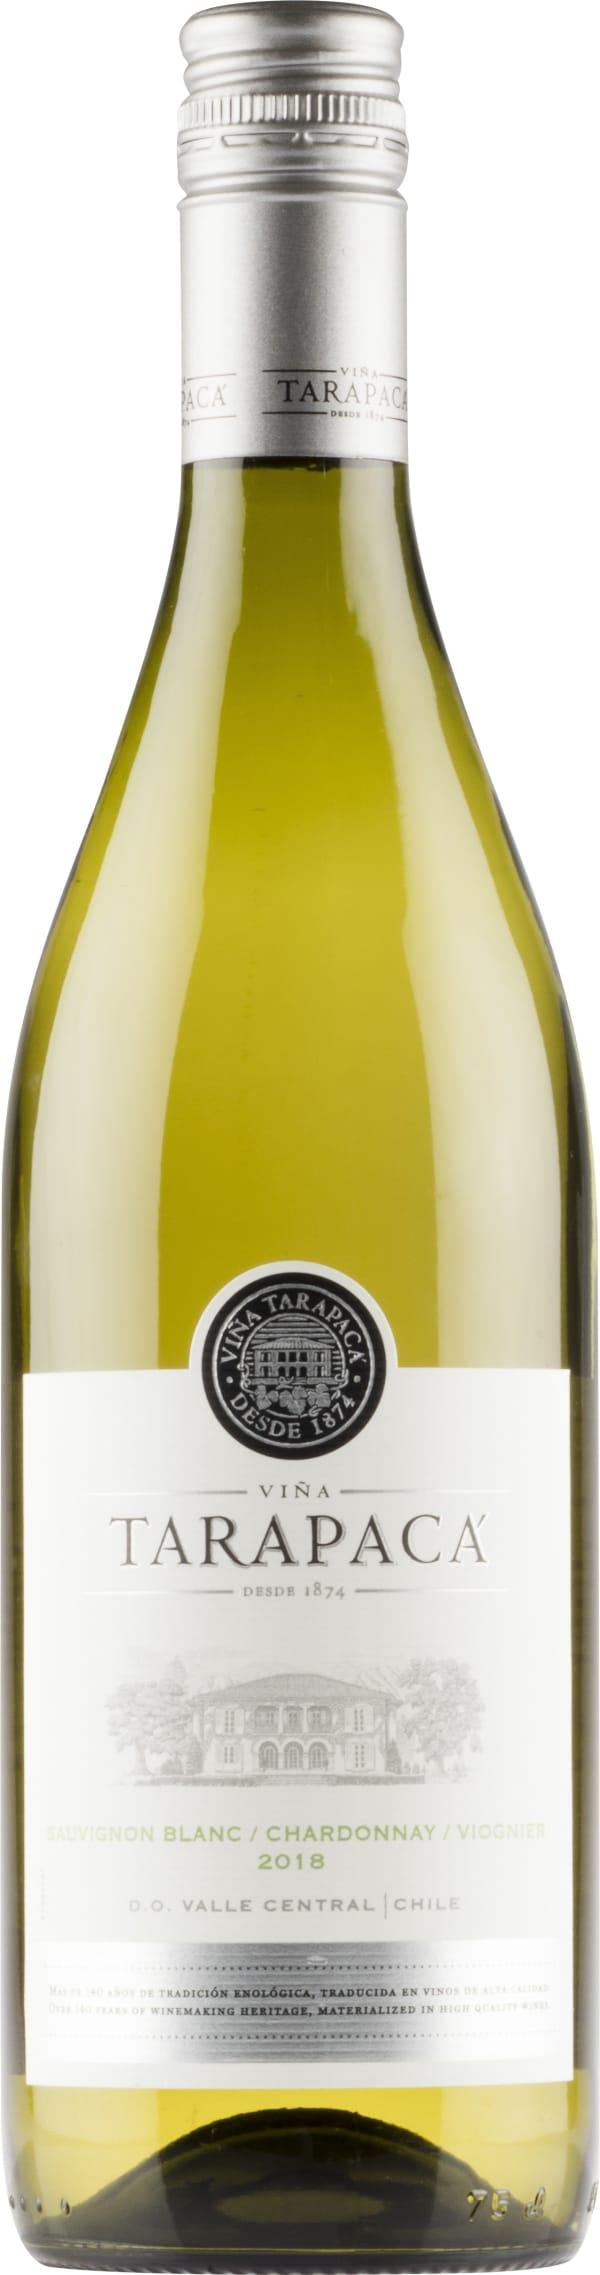 Tarapacá Sauvignon Blanc Chardonnay Viognier 2016